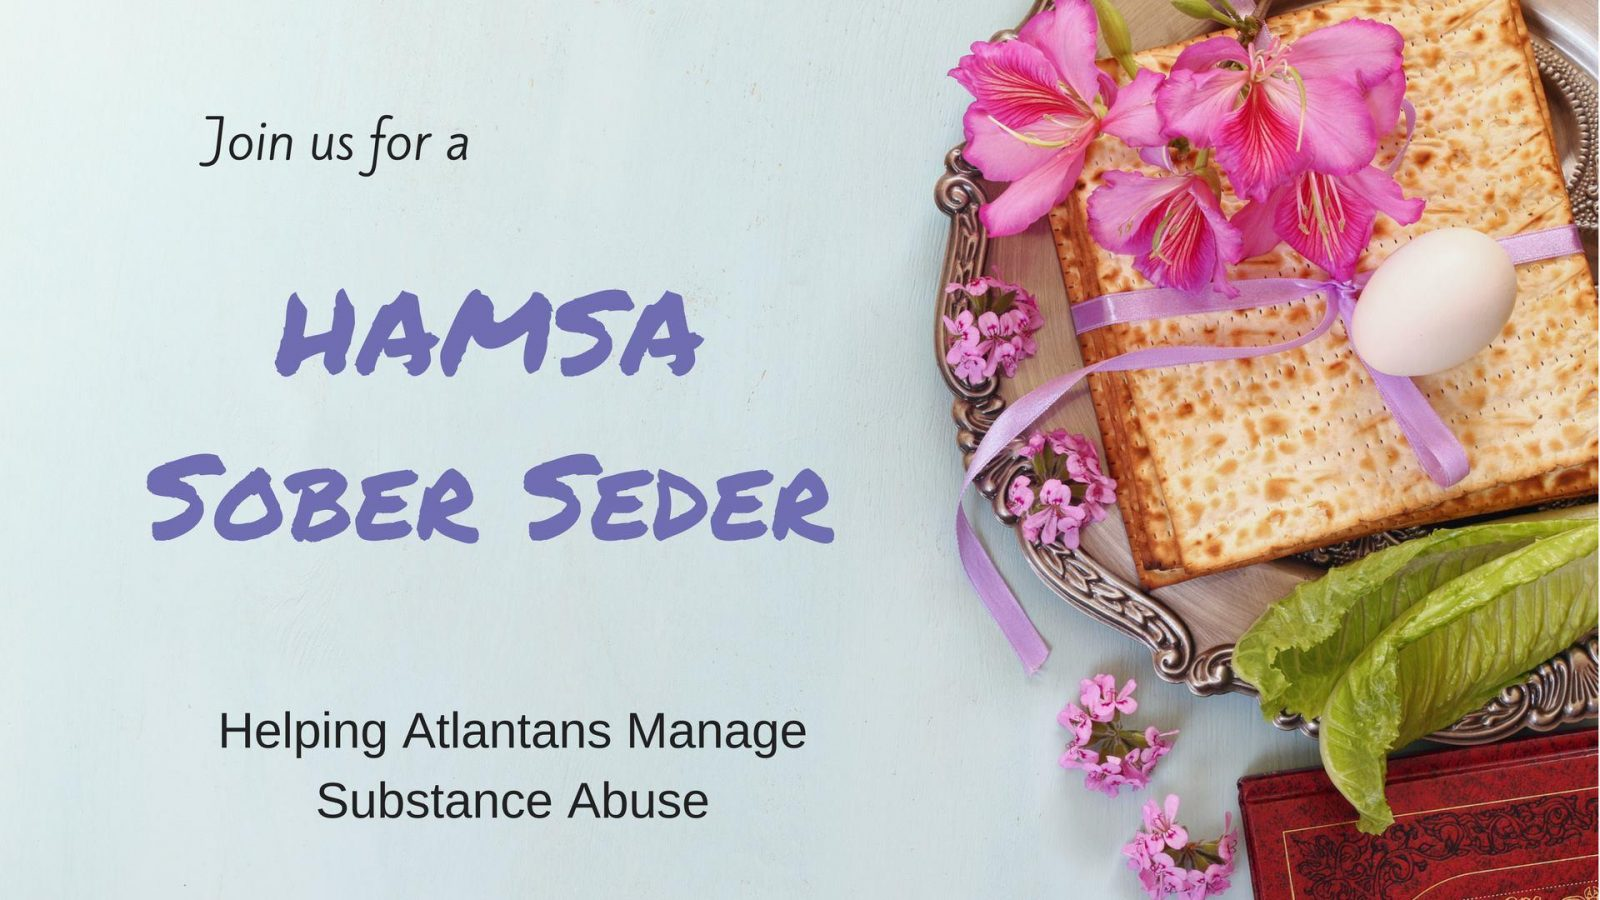 CANCELED: HAMSA SOBER SEDER